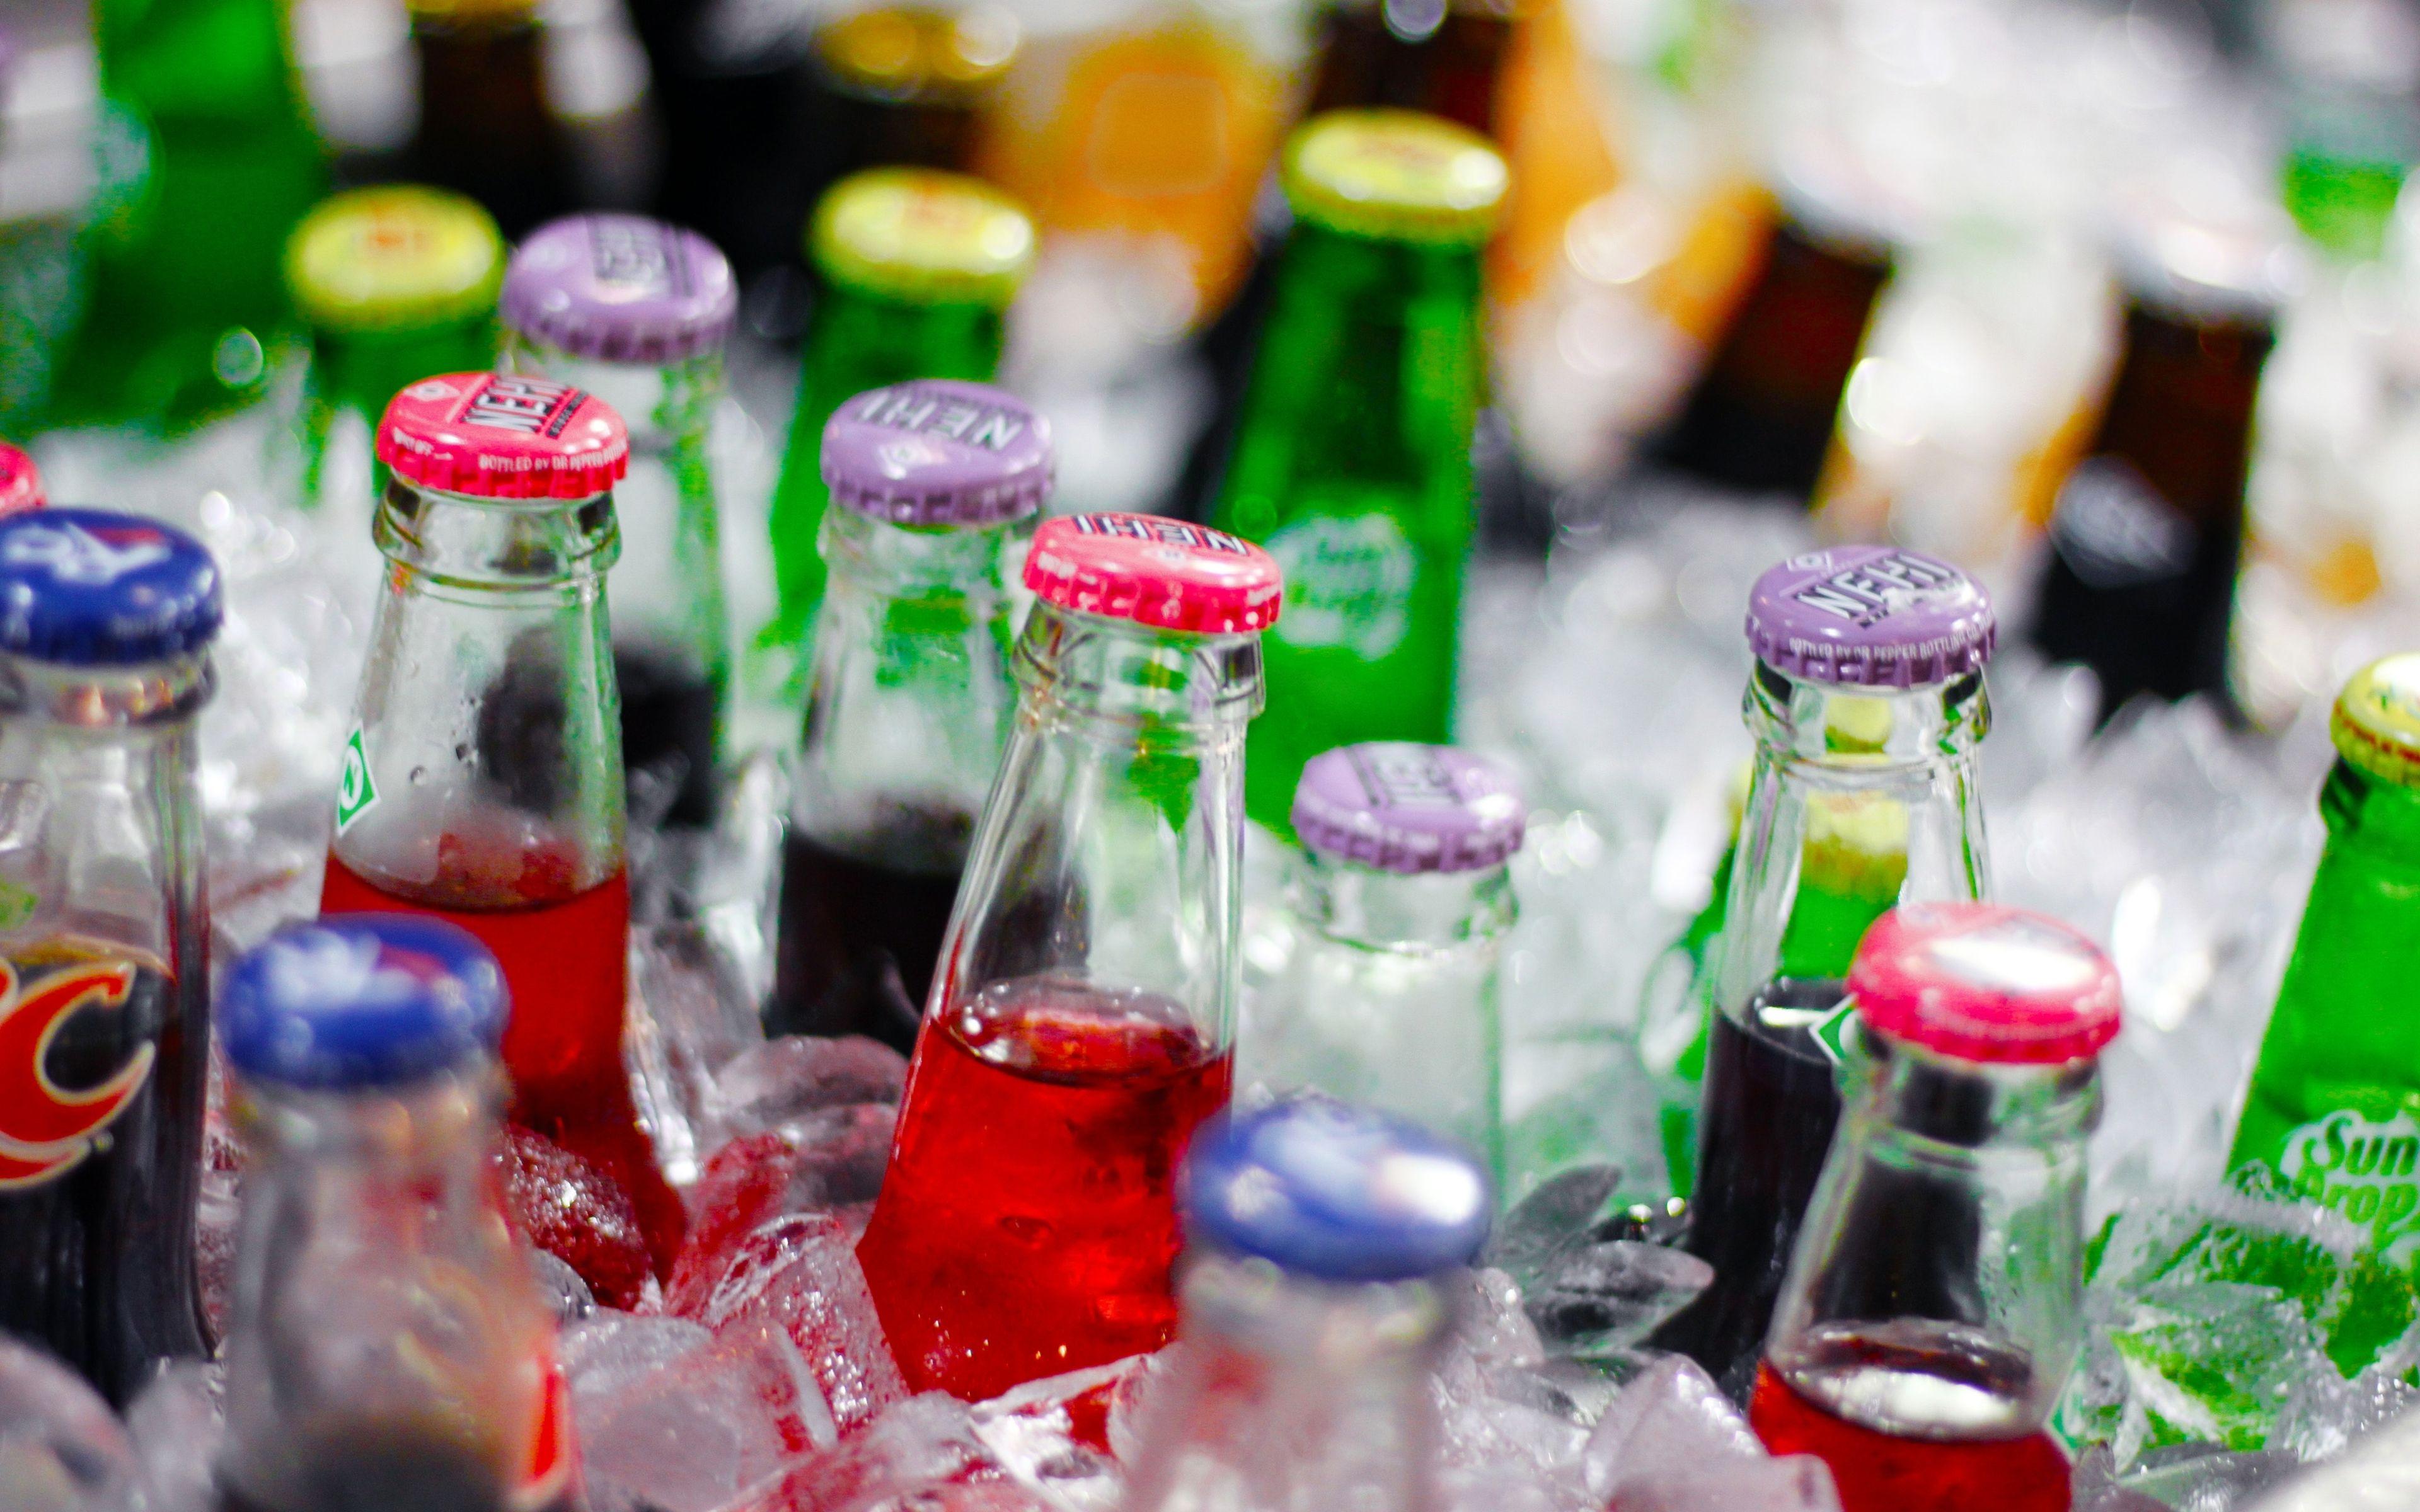 #MacBook, #Wallpaper, #Consumables | Drinks, Sugar detox ...